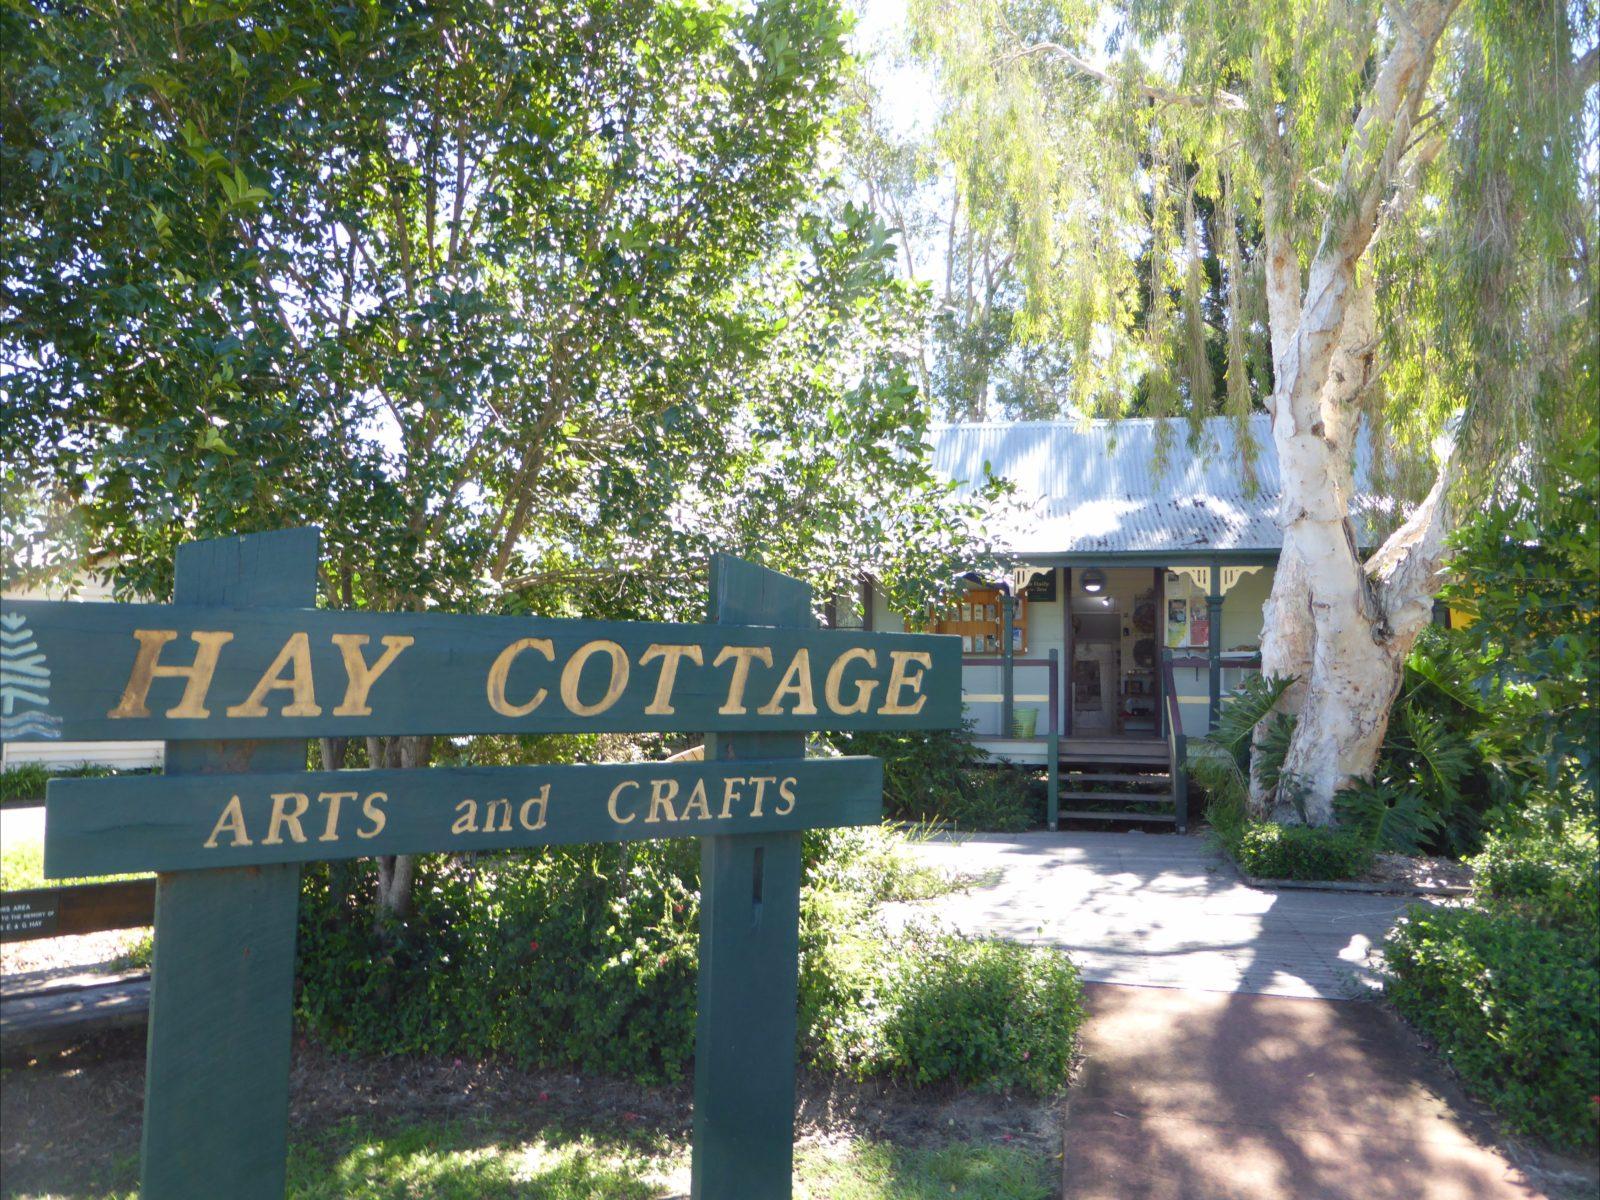 Hay_Cottage_Arts_and_Crafts_in_Dayboro_1_moreton_bay_region